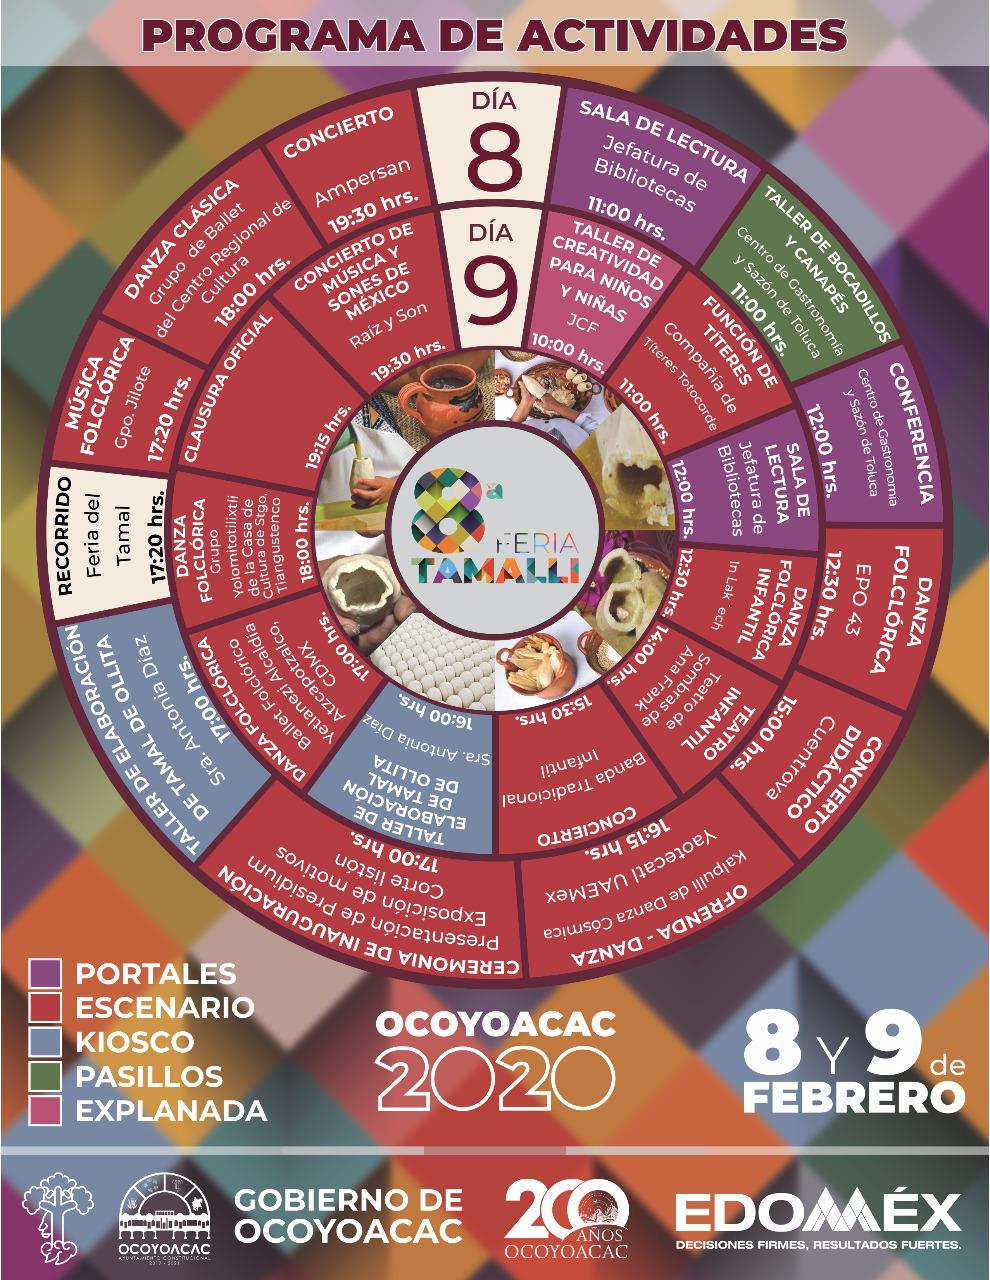 Programa de actividades Feria del Tamal Ocoyoacac 2020